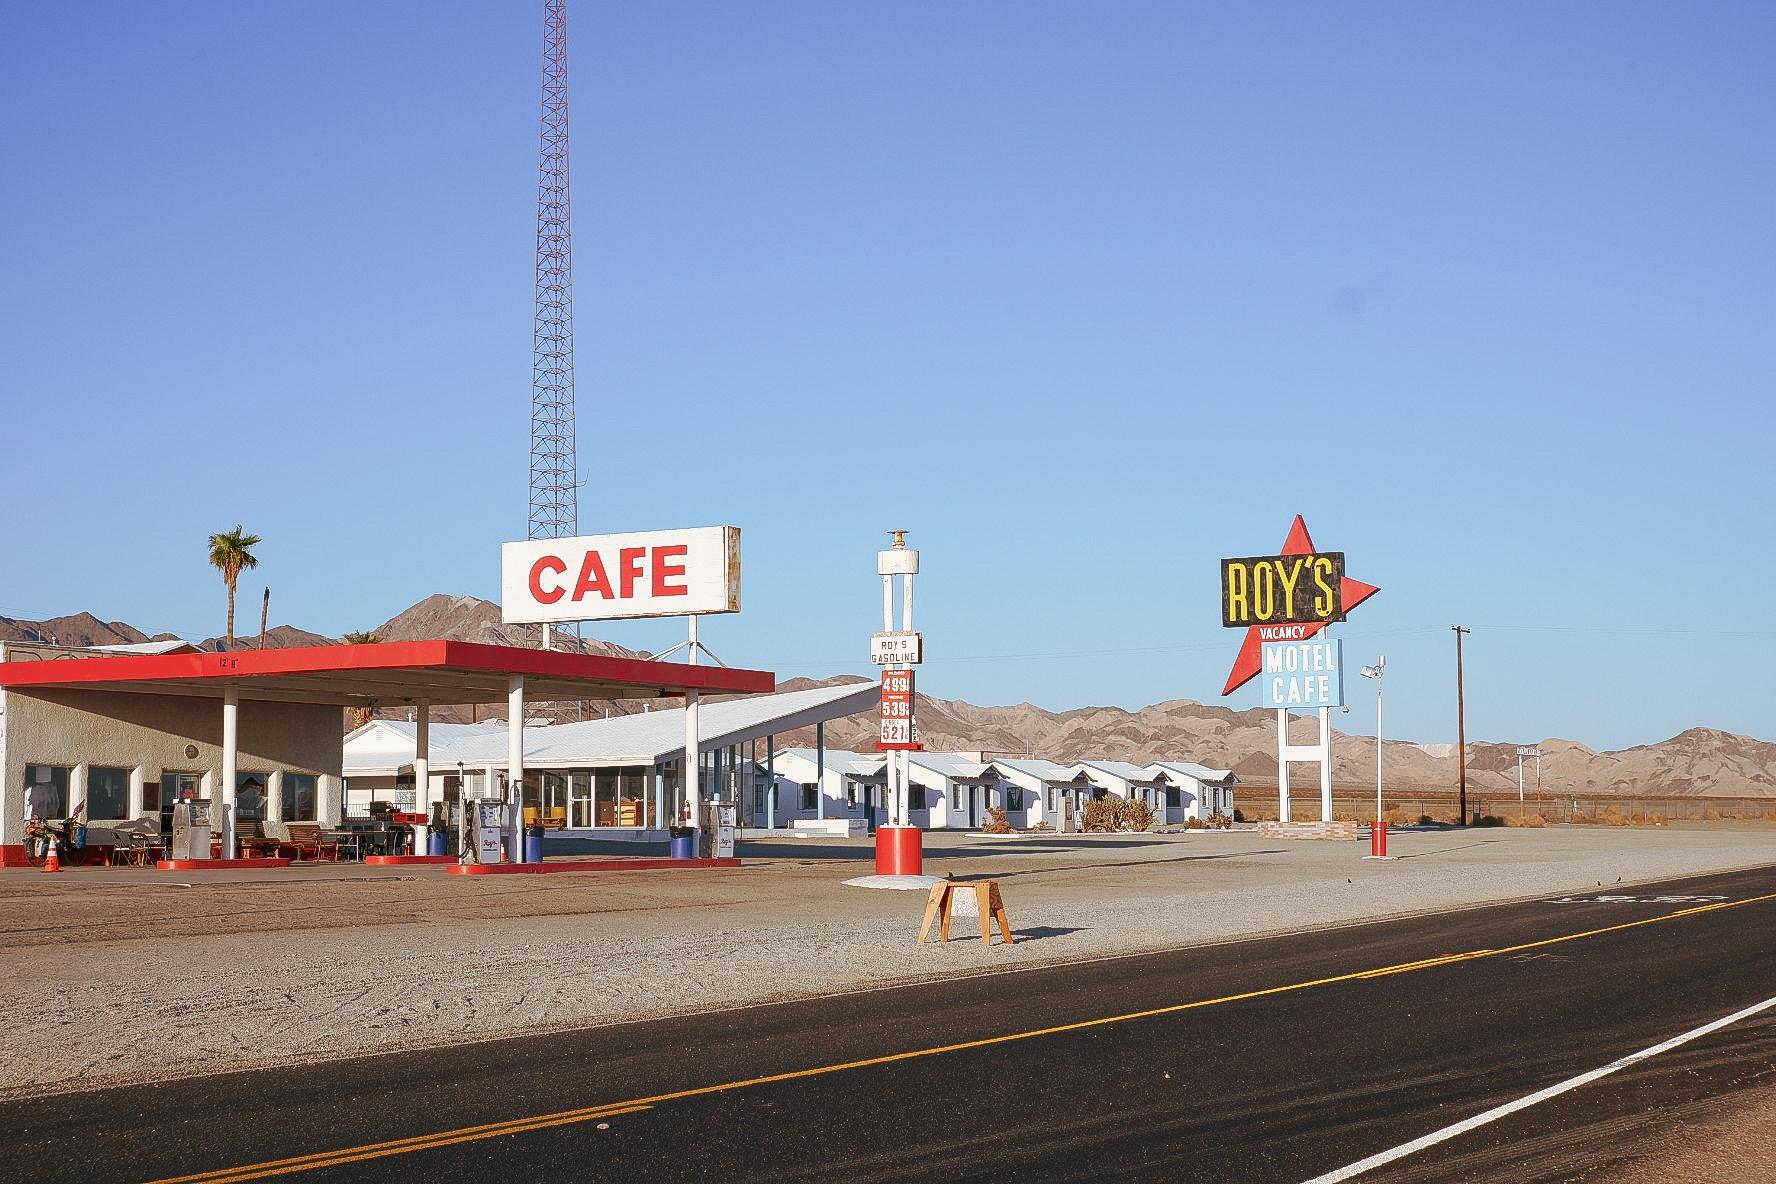 Roy's - Route 66